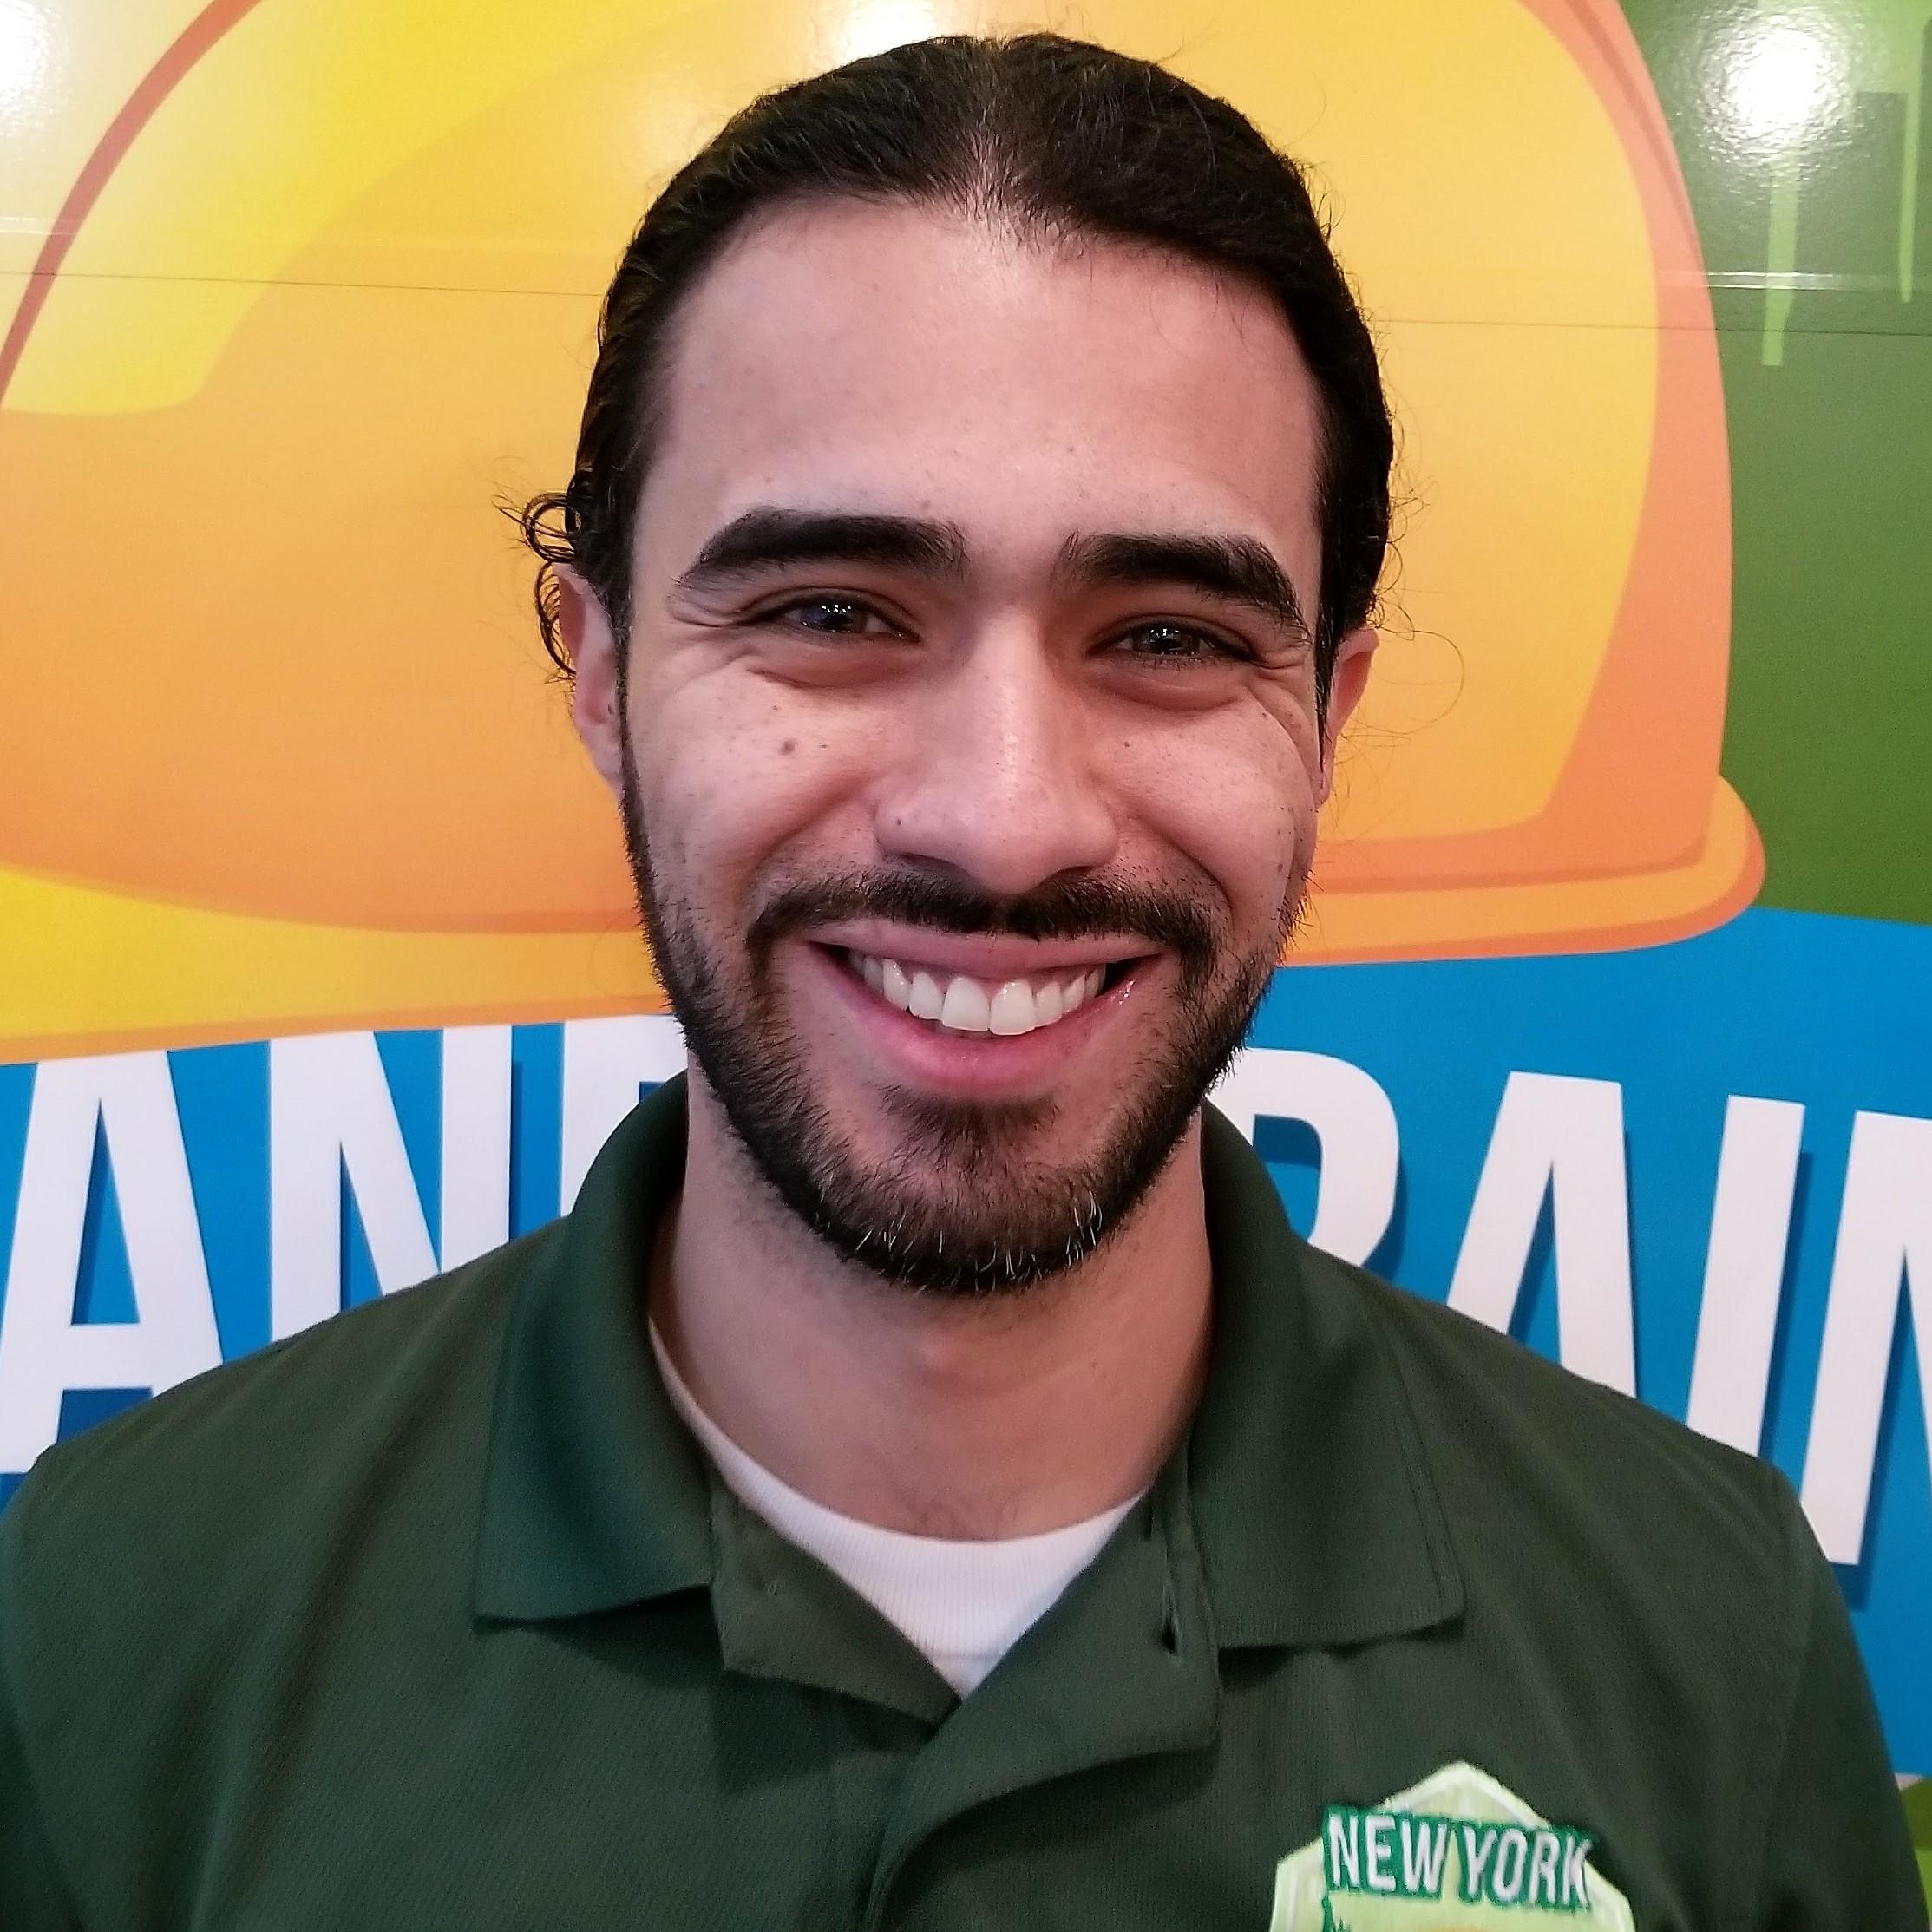 Alejandro Alvares